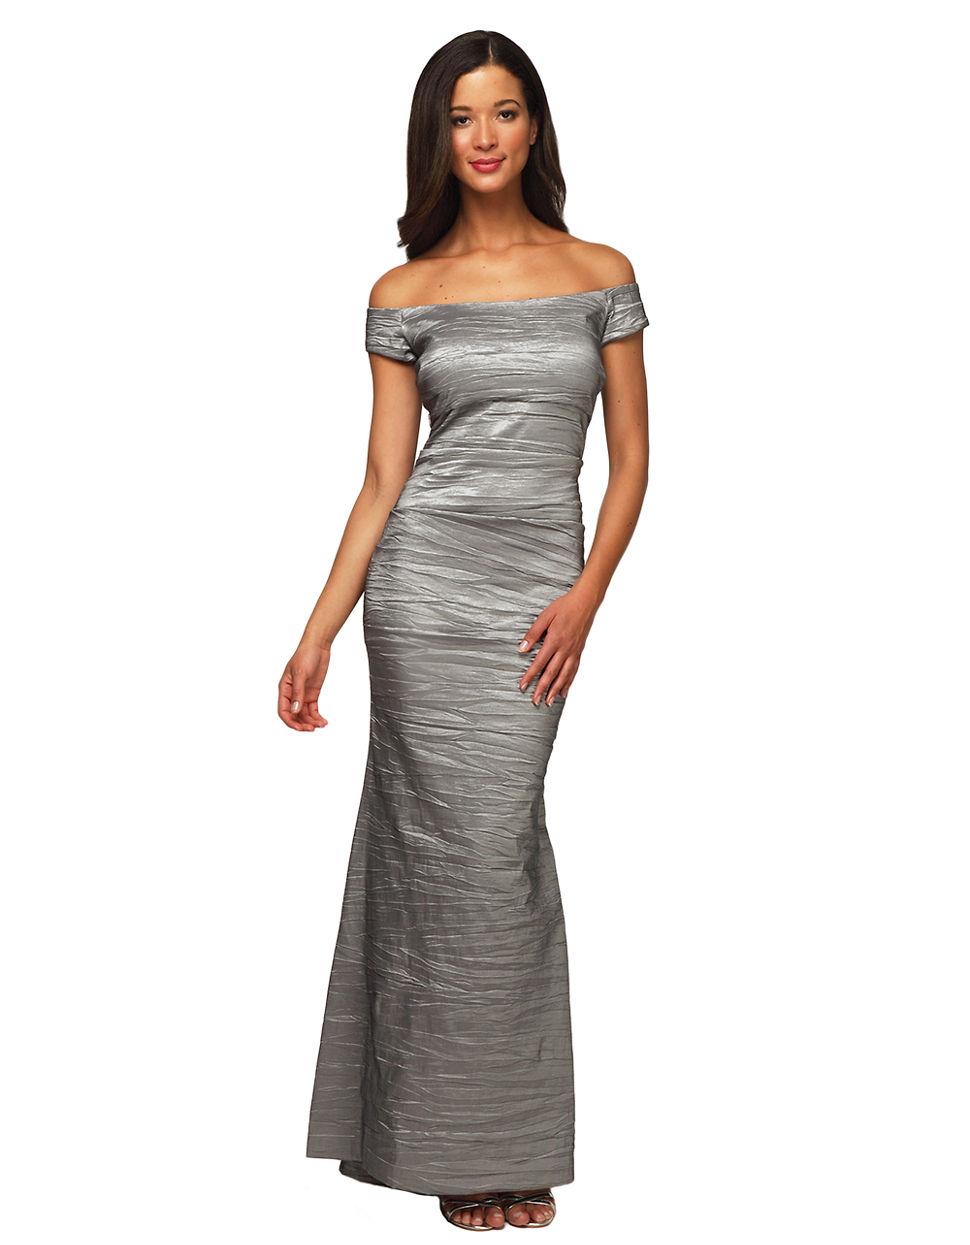 Lyst - Alex Evenings Long Off The Shoulder Stretch Taffeta Dress in Gray